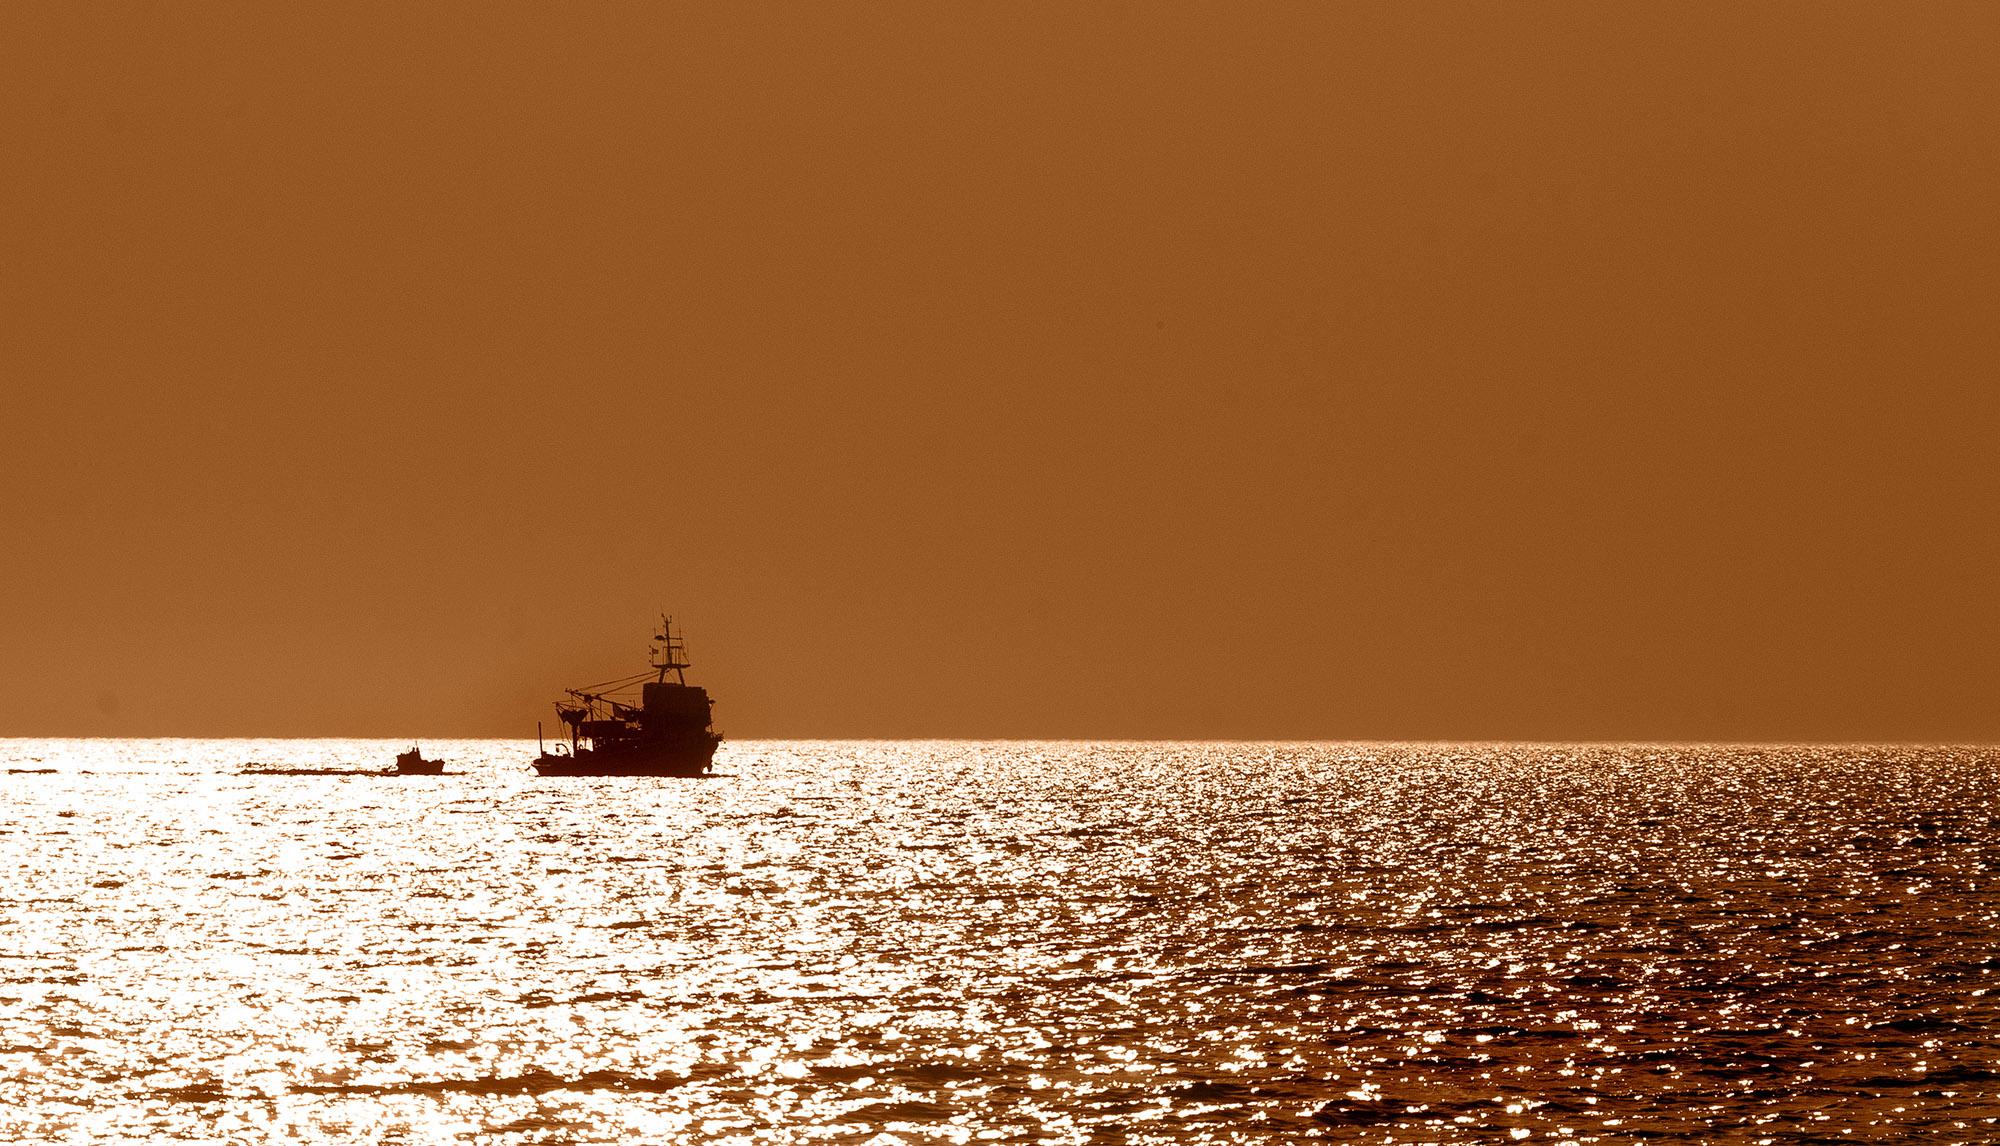 Andrej Repar: Monochrome